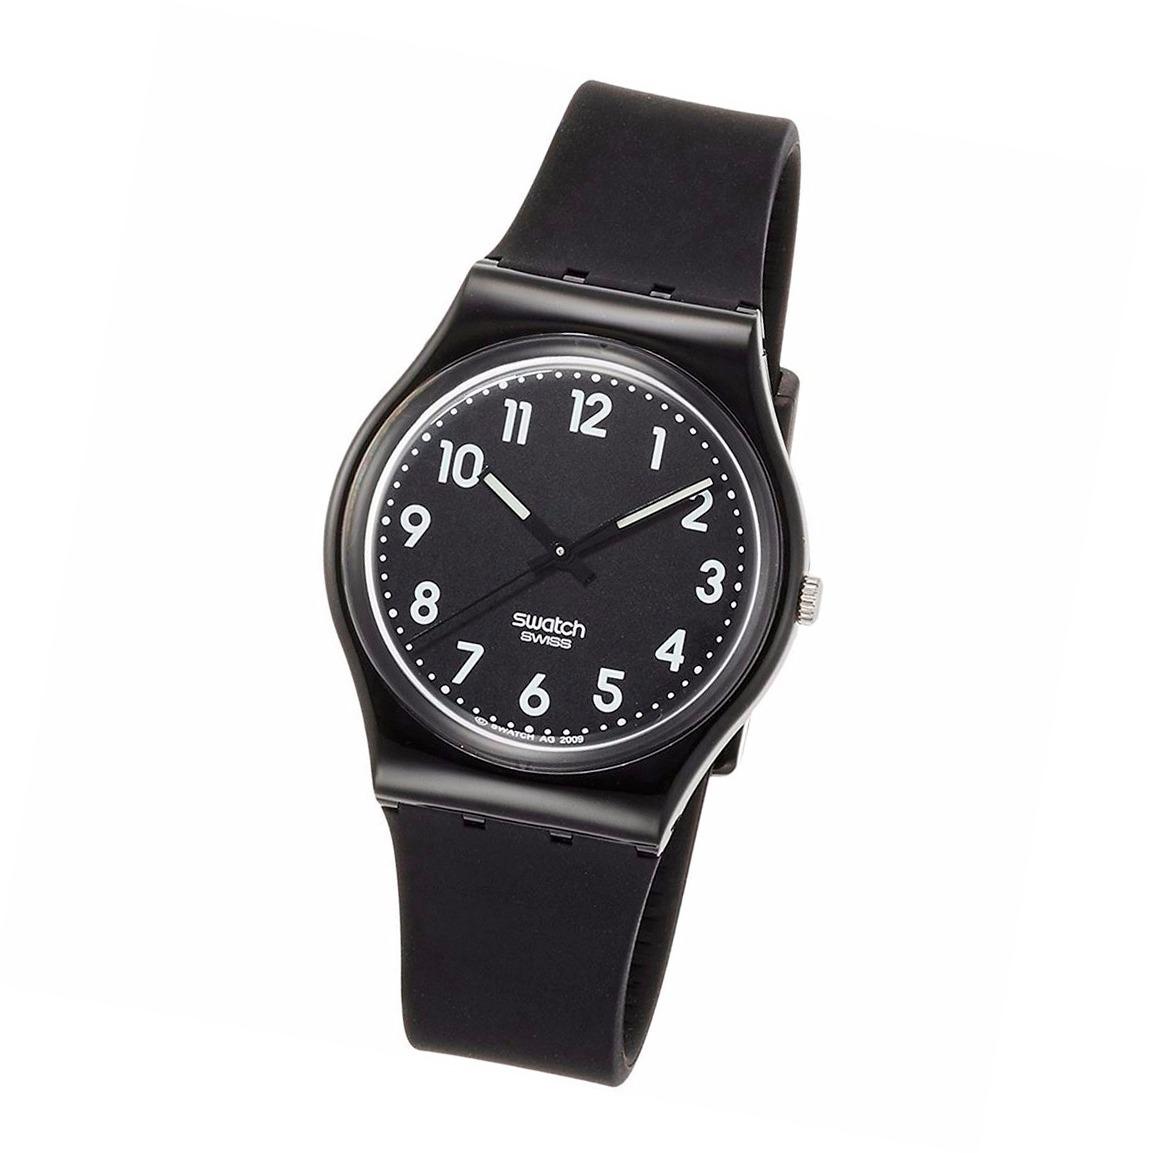 Wr Malla Gb247t Black Suit Plastica Charol Reloj Swatch 30m O8PNkXn0w